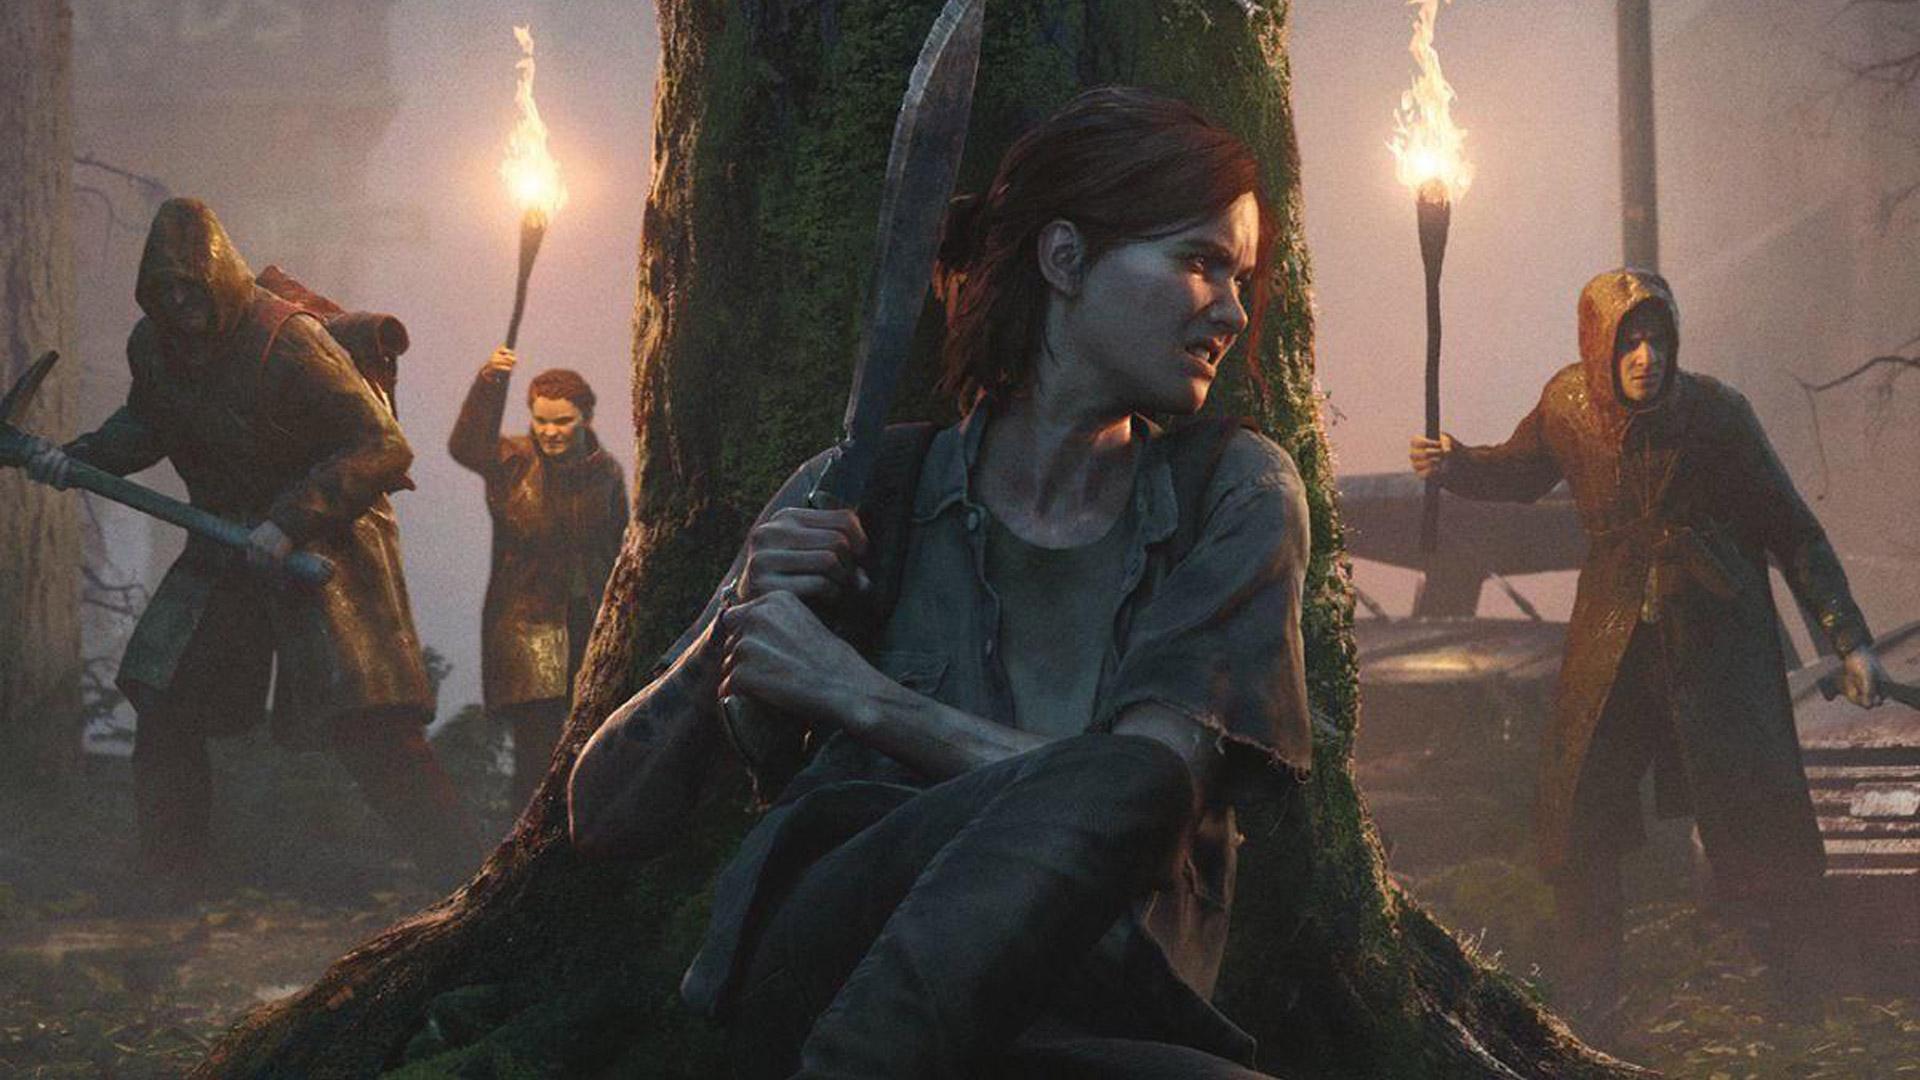 Free The Last of Us Part II Wallpaper in 1920x1080